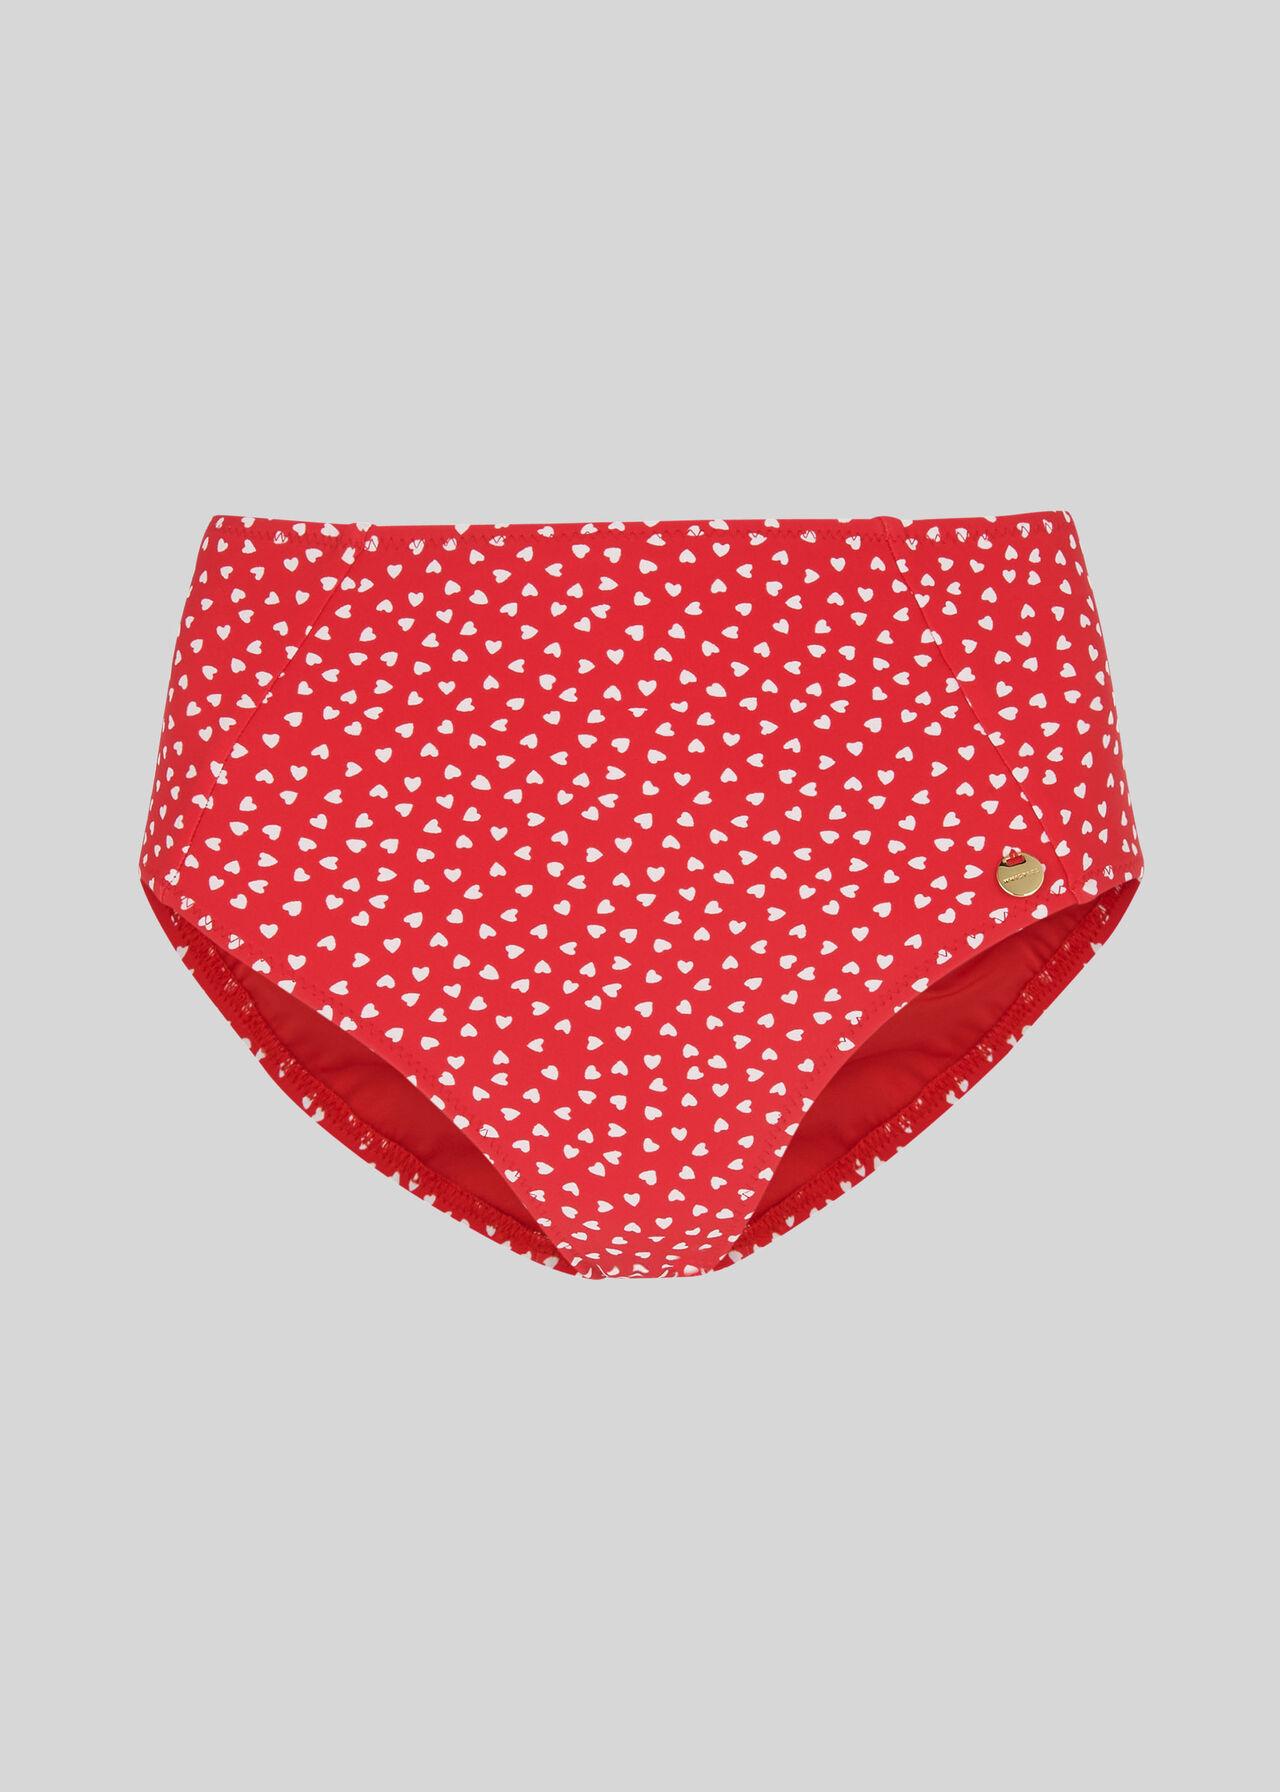 Heart Print Bikini Bottom Red/Multi